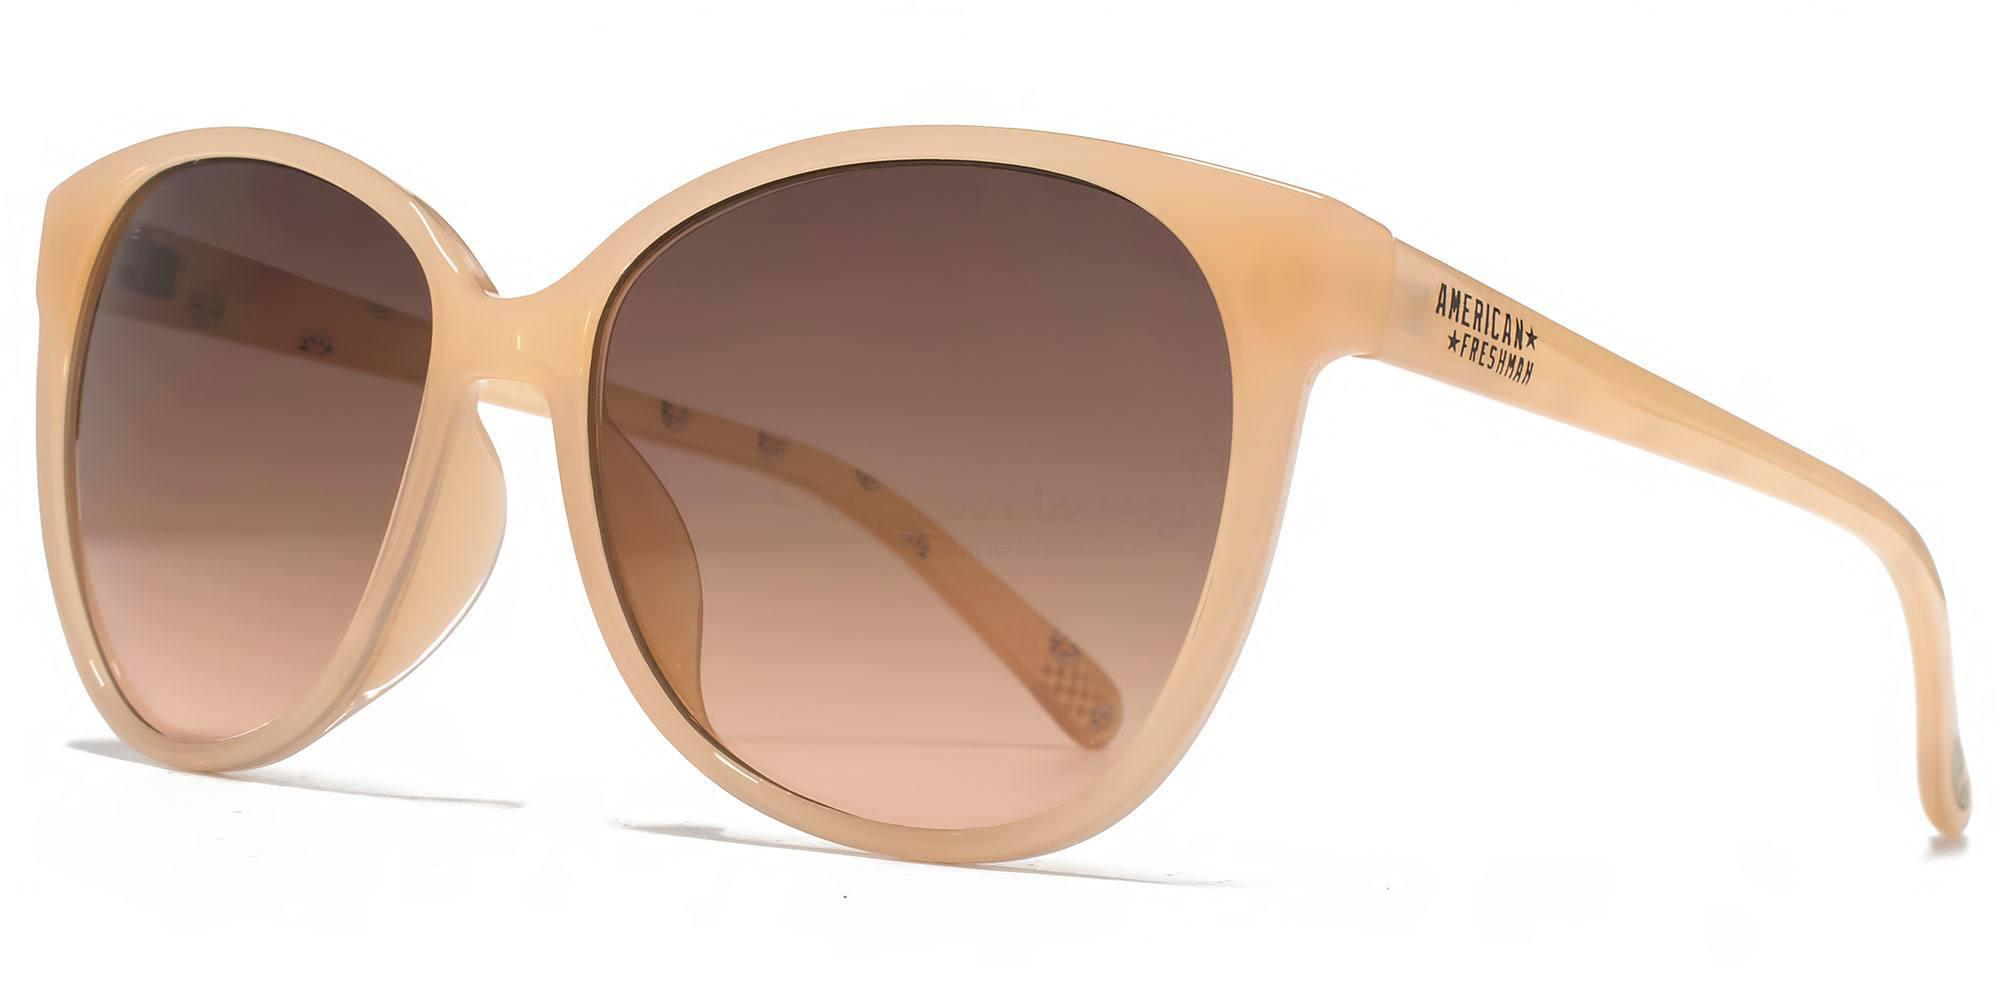 AFS011 BROOKE Sunglasses, American Freshman